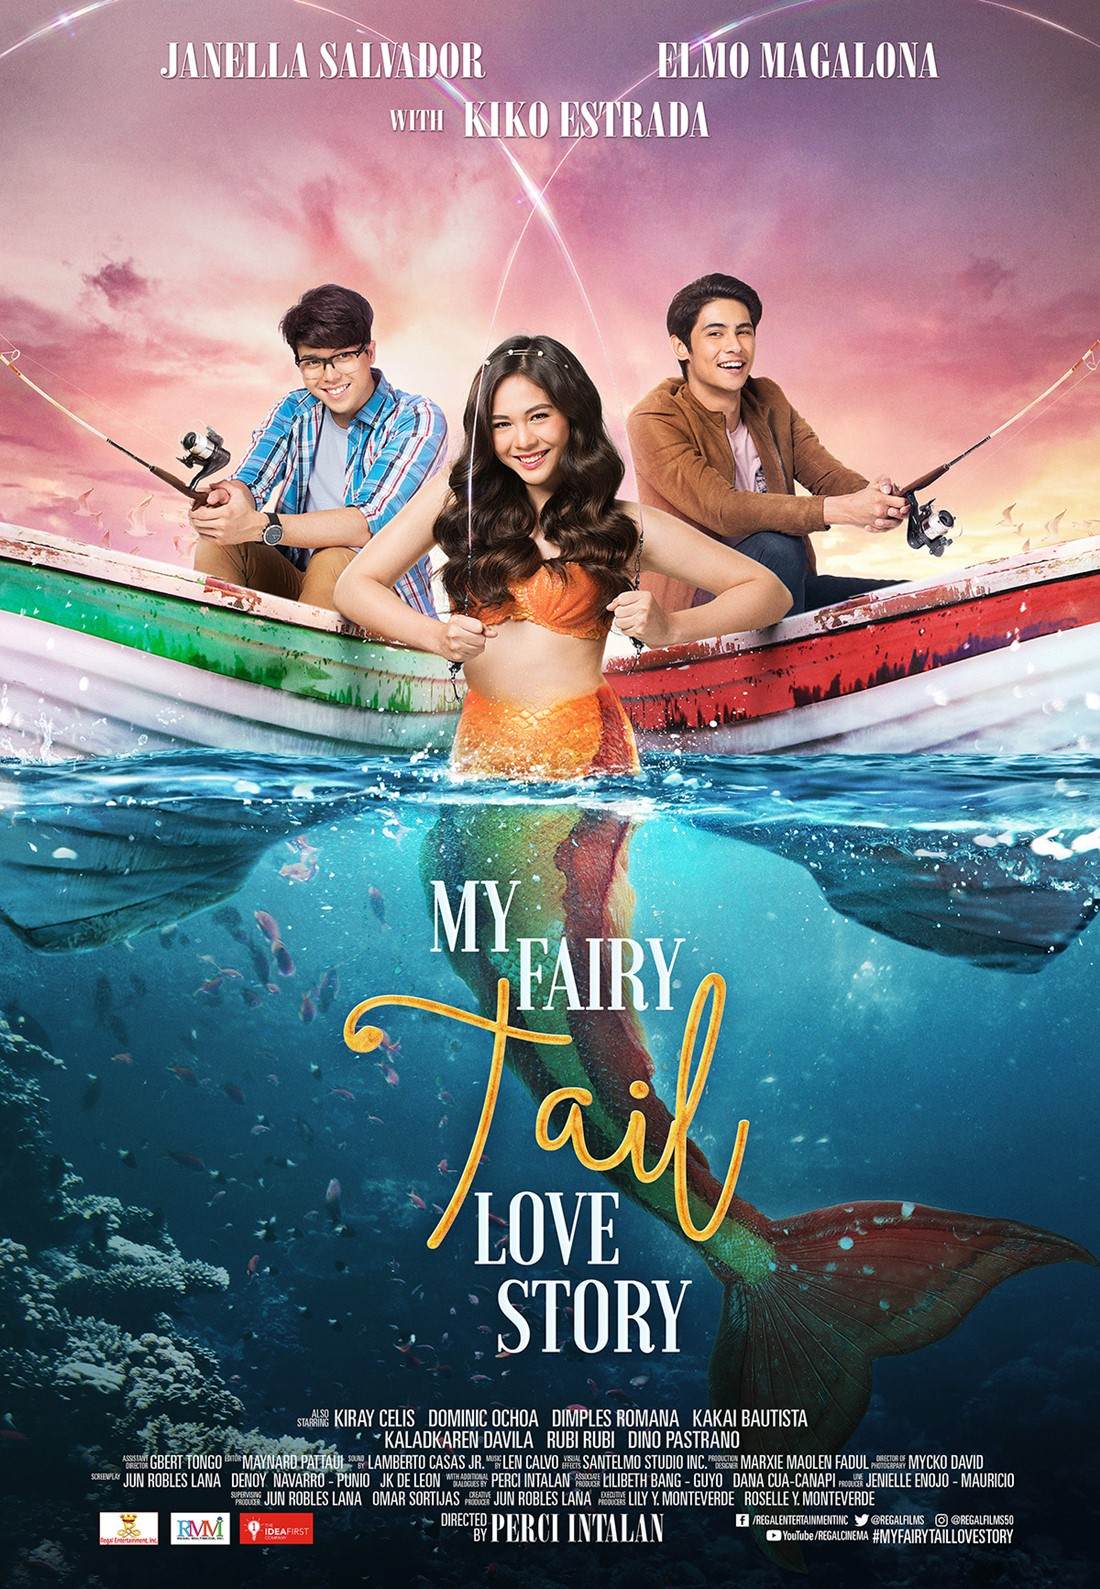 14 My Fairy Tail Love Story